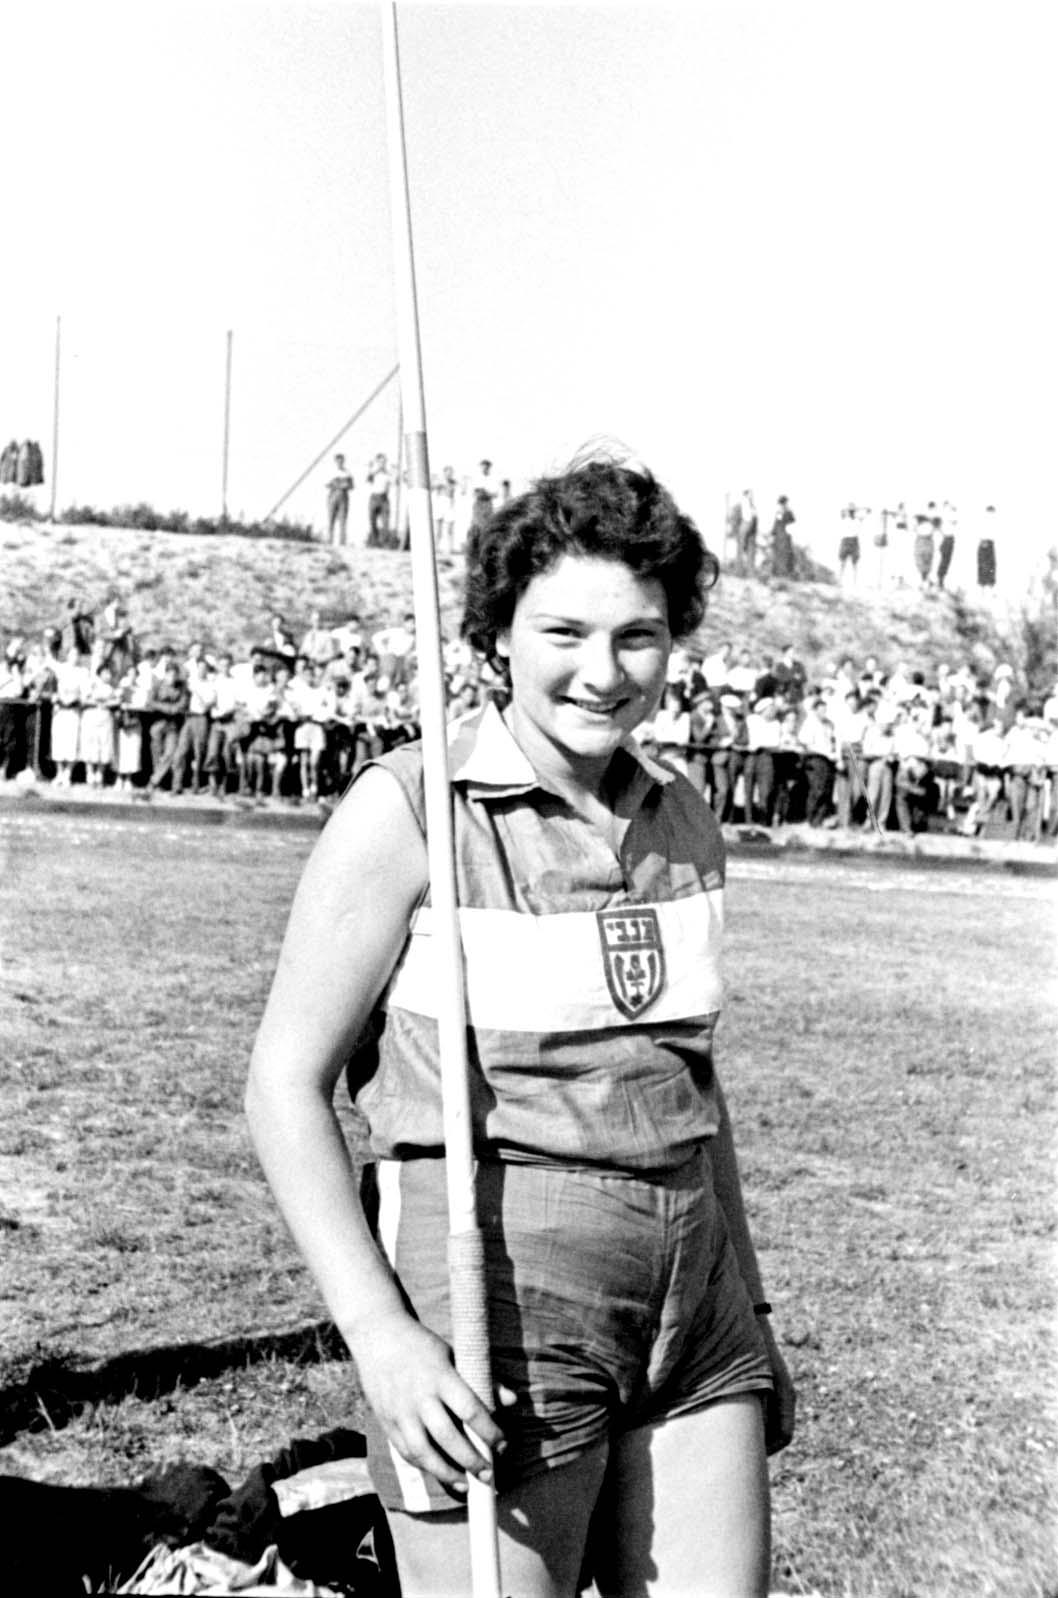 Berlin, Germany, 16 6 1935, Martel Yakob, from Maccabi, with a javelin at the Maccabi Berlin International Sports Day